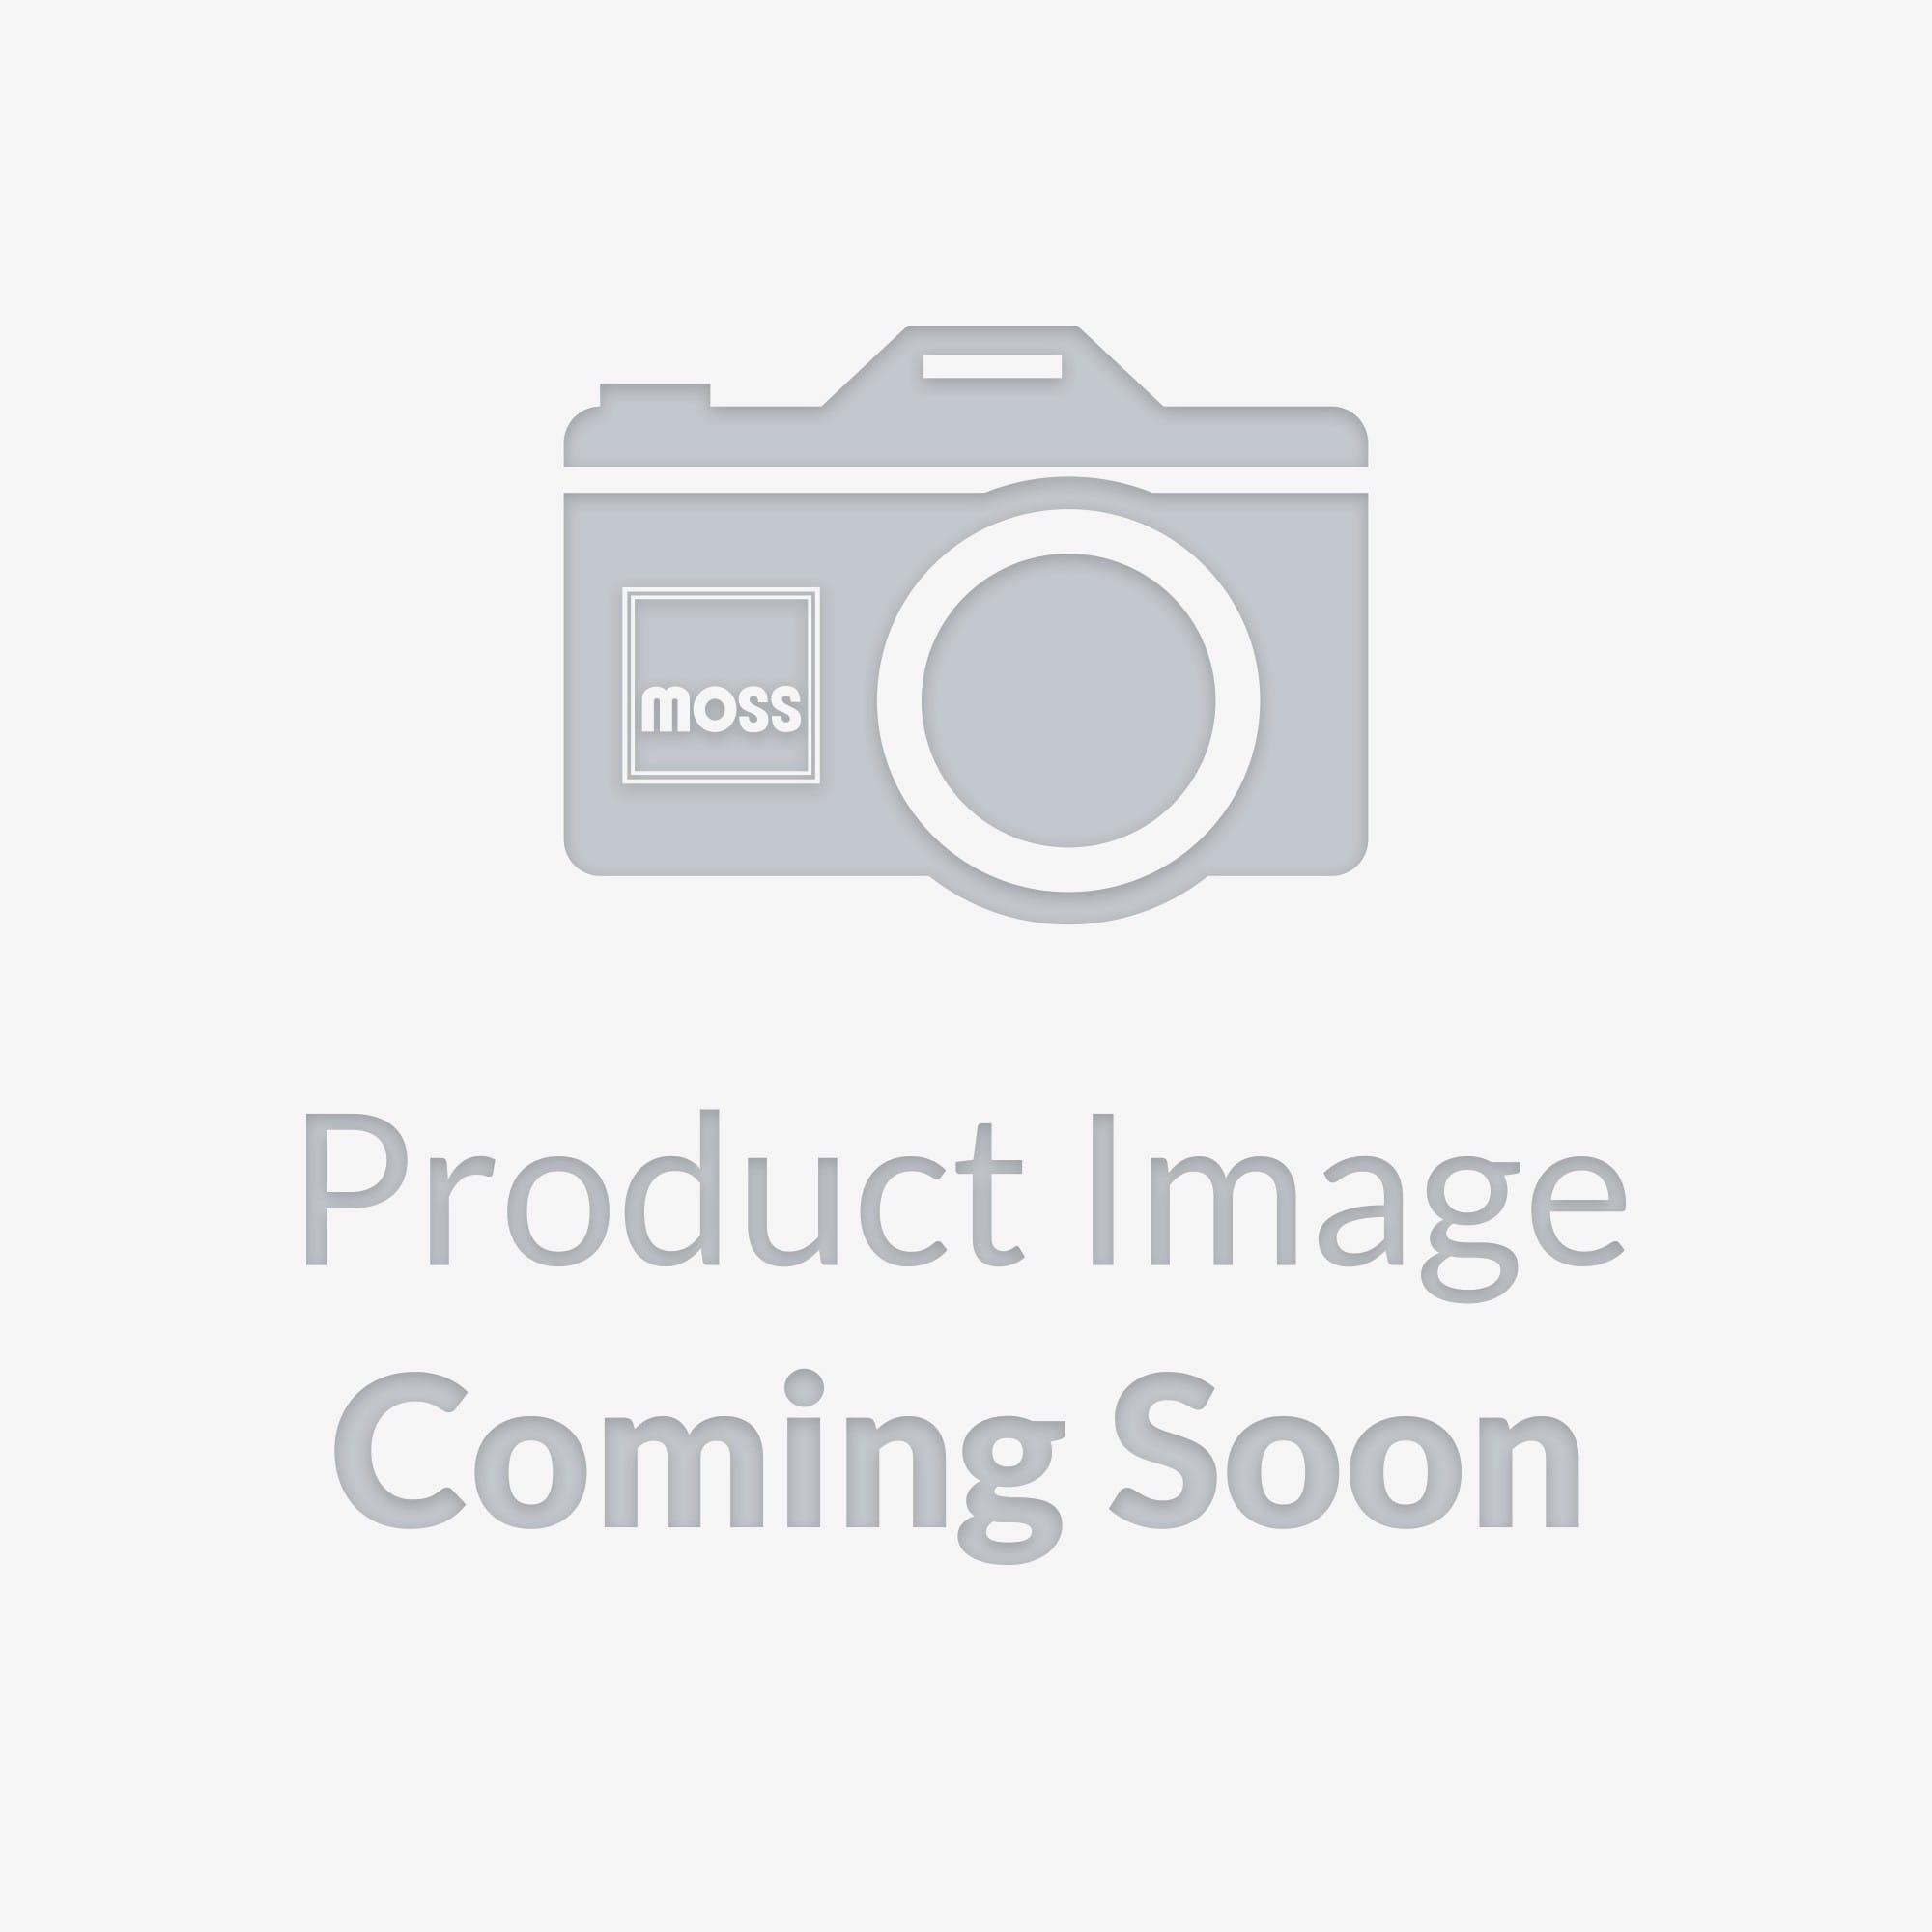 242 890 Bra Moss Motors